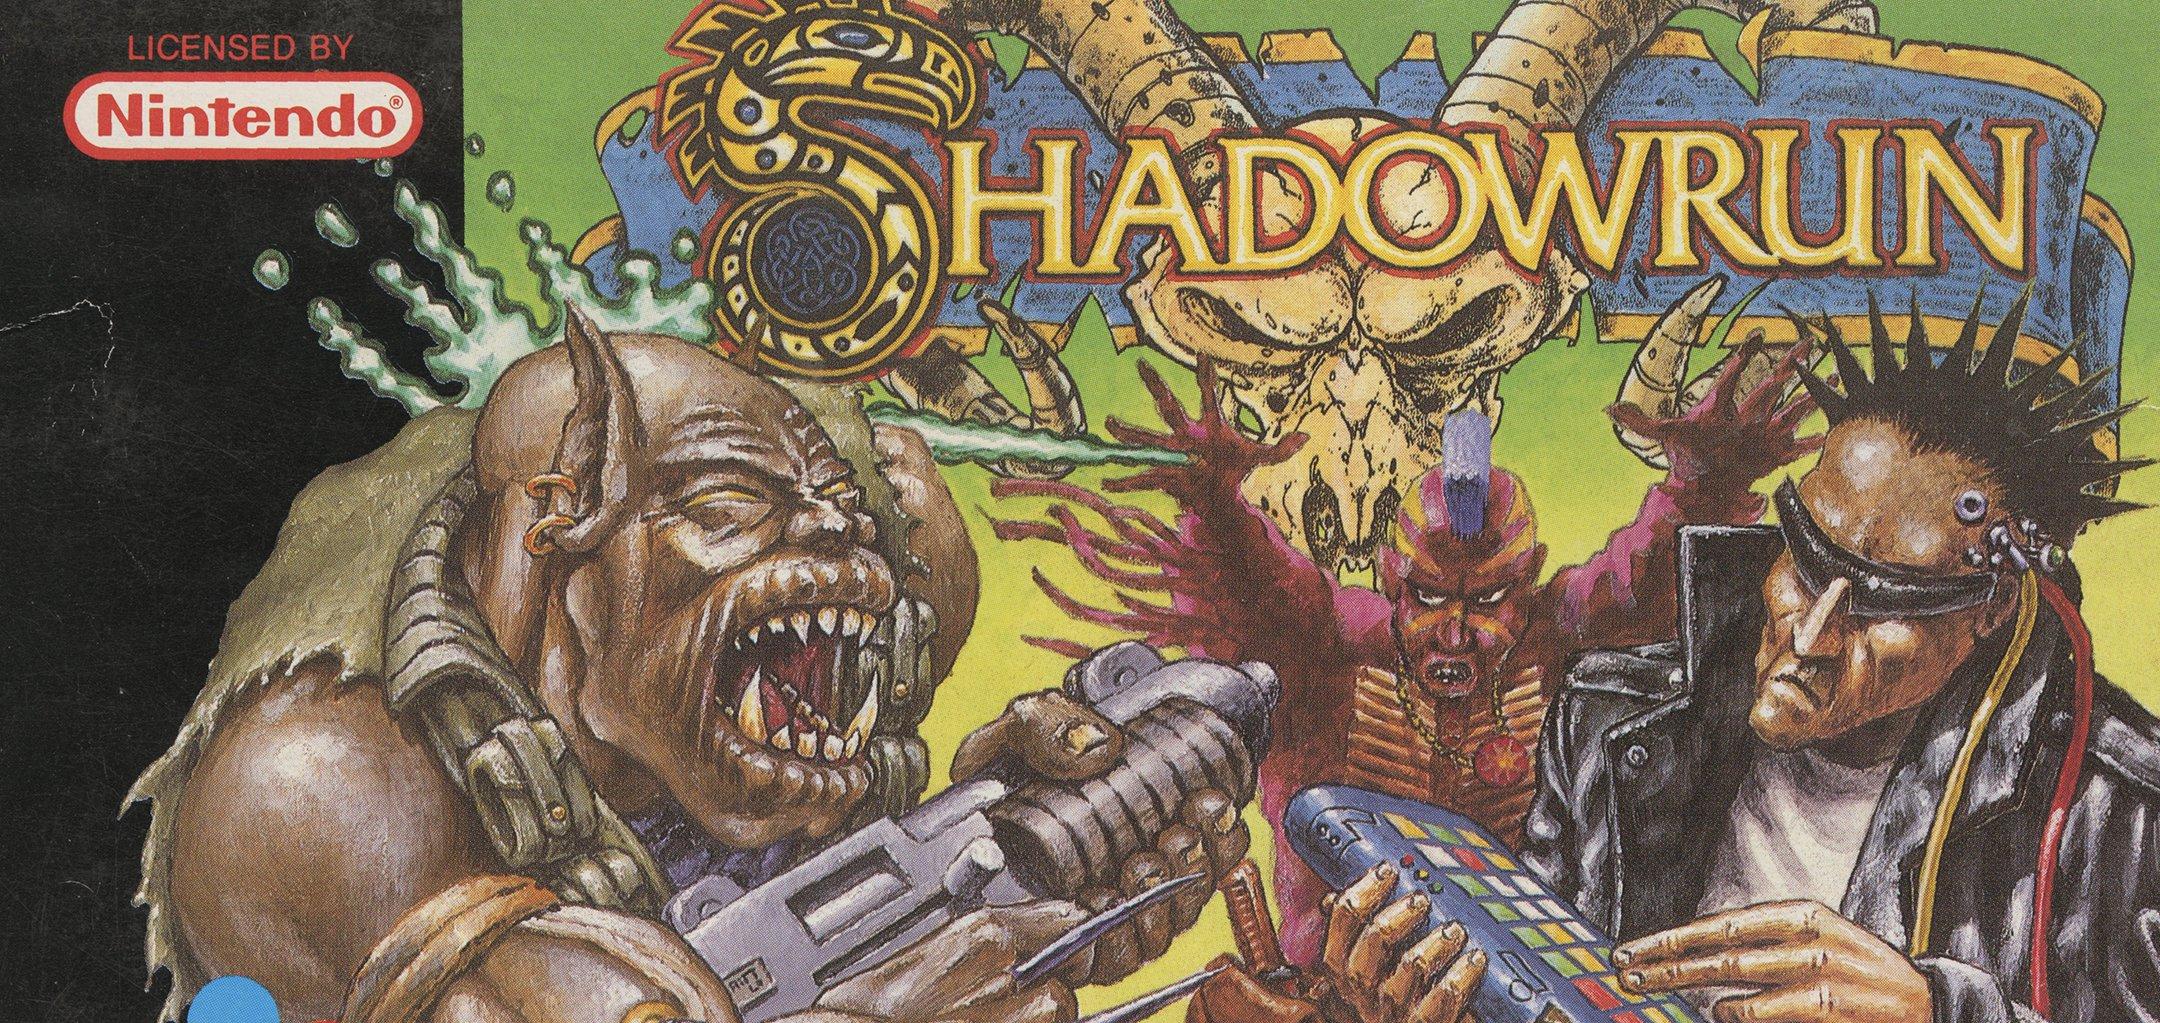 Retail box for Shadowrun (1993)